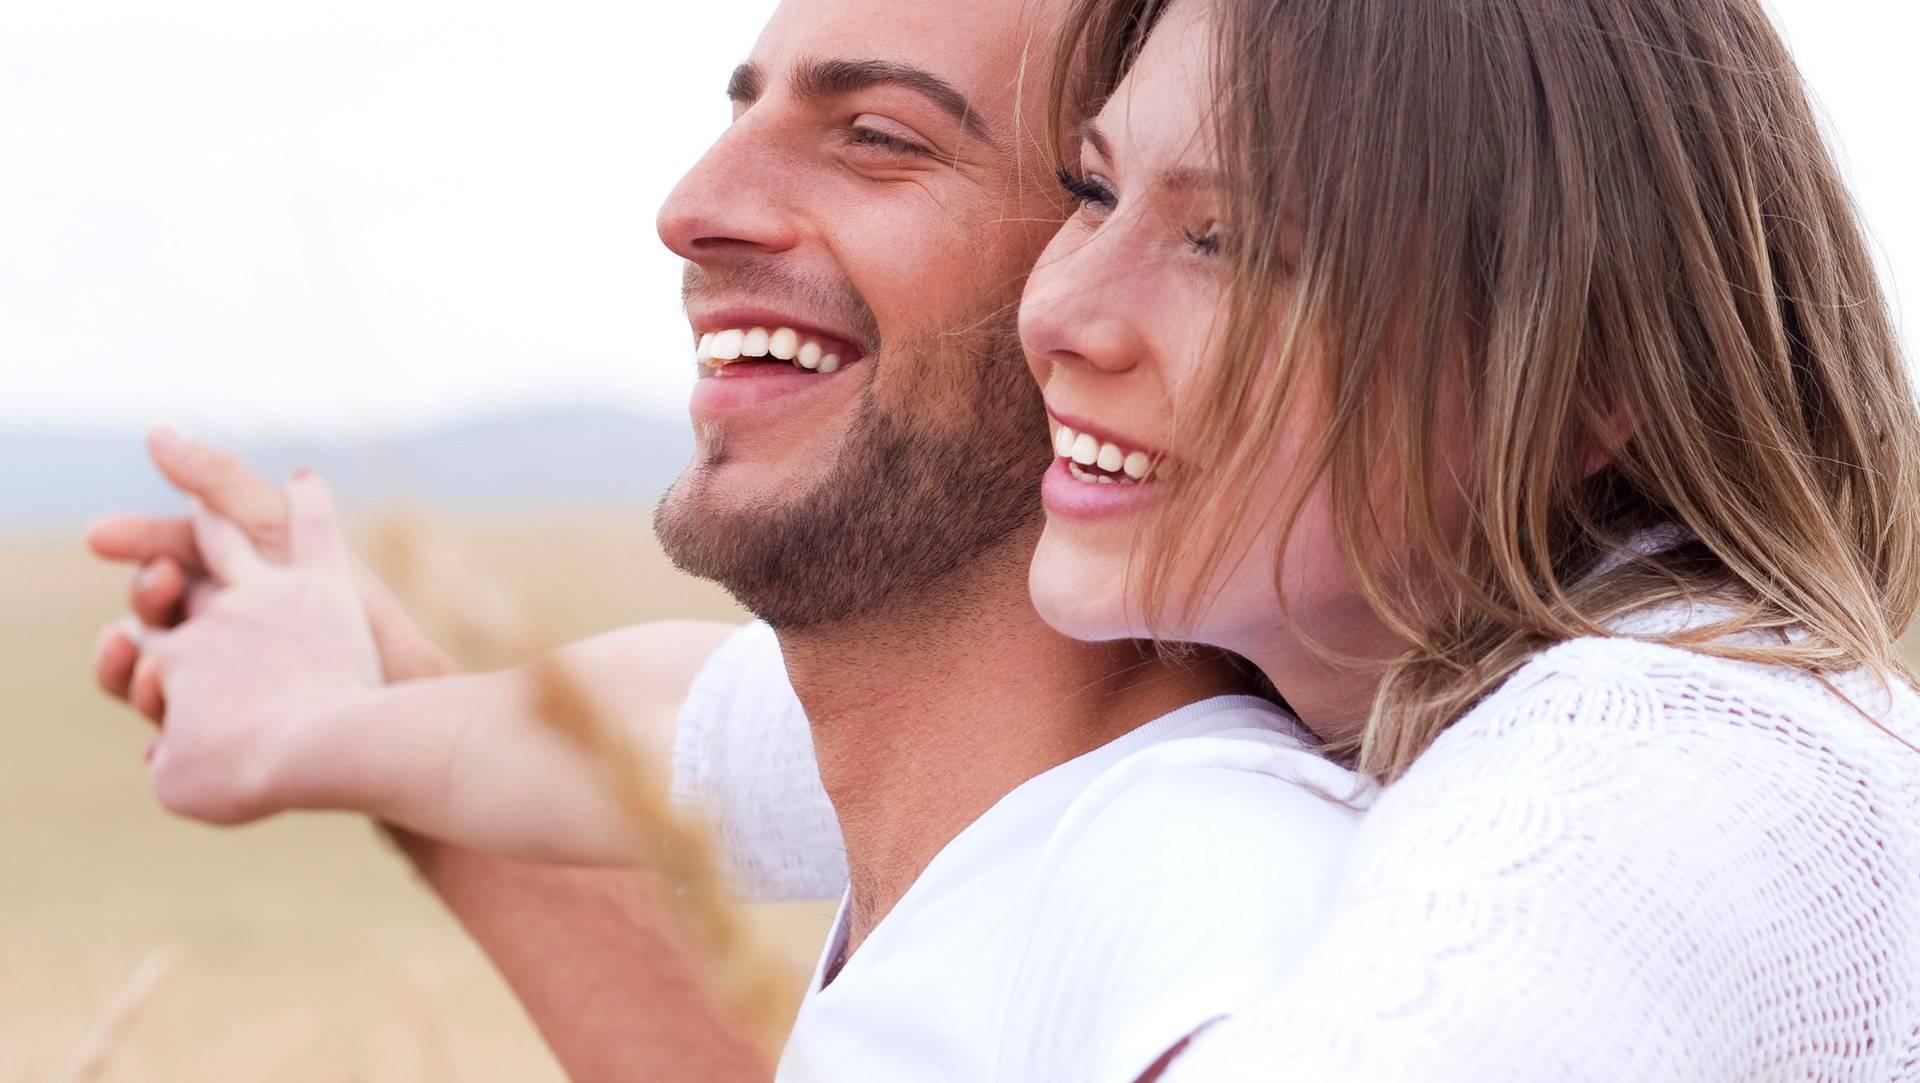 Christian online dating yli 50